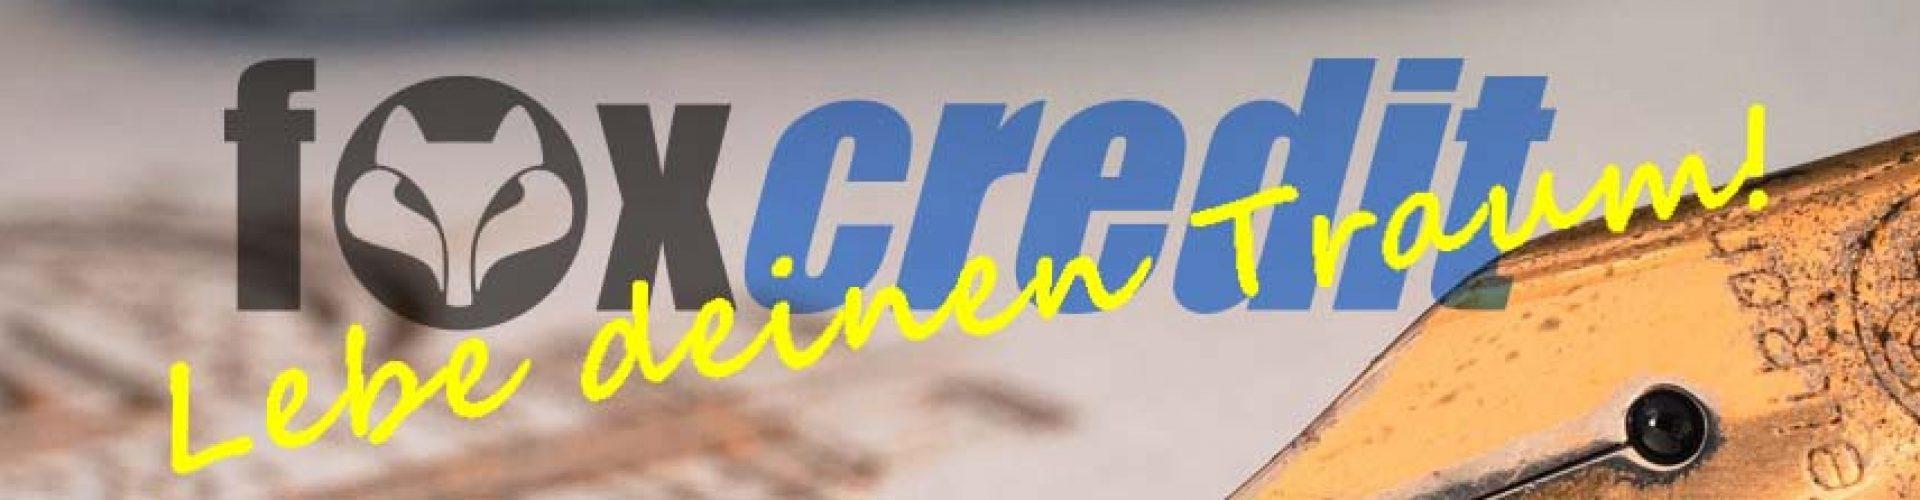 KMU Kredit, KMU-Kredit, Schweiz, KMU Kredit Schweiz, Handeys Finanzen, Hypothek, Immobilien, Crowdlending, Lend, Kredit Schweiz, Online-Kredit, Maximalzins, Zinsobergrenze, Kreditregister, Foxcredit, Kleinkredit, Online Kredit, Onlinekredit, Finanzierung, Kredit, loan, Leasing, Zinssatz, Hypothek, Bank, Bankkonto, Bitcoin, Finanzjongleure, Eurozone, Euro, Franken, Krypto, Dollar, Auto Kredit, Ferien Kredit, Wein Kredit, Immo Kredit, Raten Kredit, Medi Kredit, Privat Kredit, Klein Kredit, Sofort Kredit, Umschuldungskredit, Raten Kredit, Bon Kredit, Bon-Kredit, Budget, Kreditwürdigkeit, Webtech Media, WebTech, Website Design, Website Flaterate, webtech2web, Girokonto, Gold, Kreditinformation